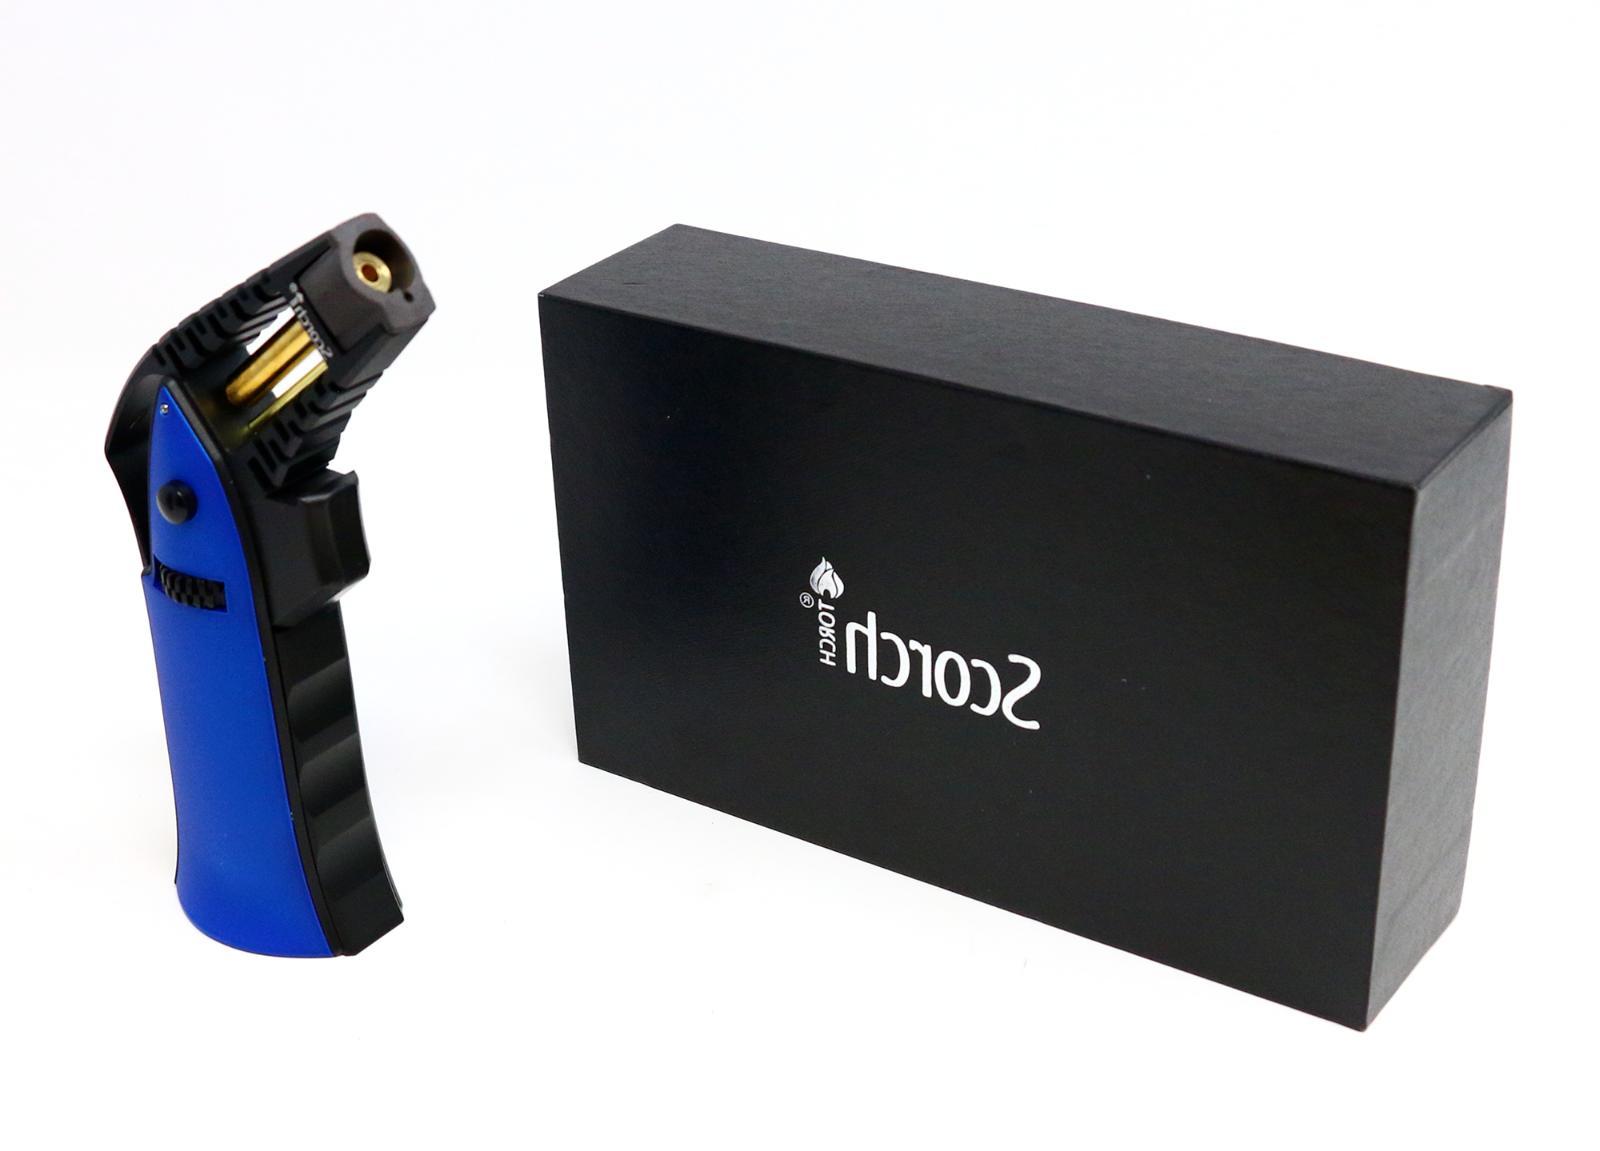 Scorch Torch 51470 Handheld Flame Adjustable Butane Refillab